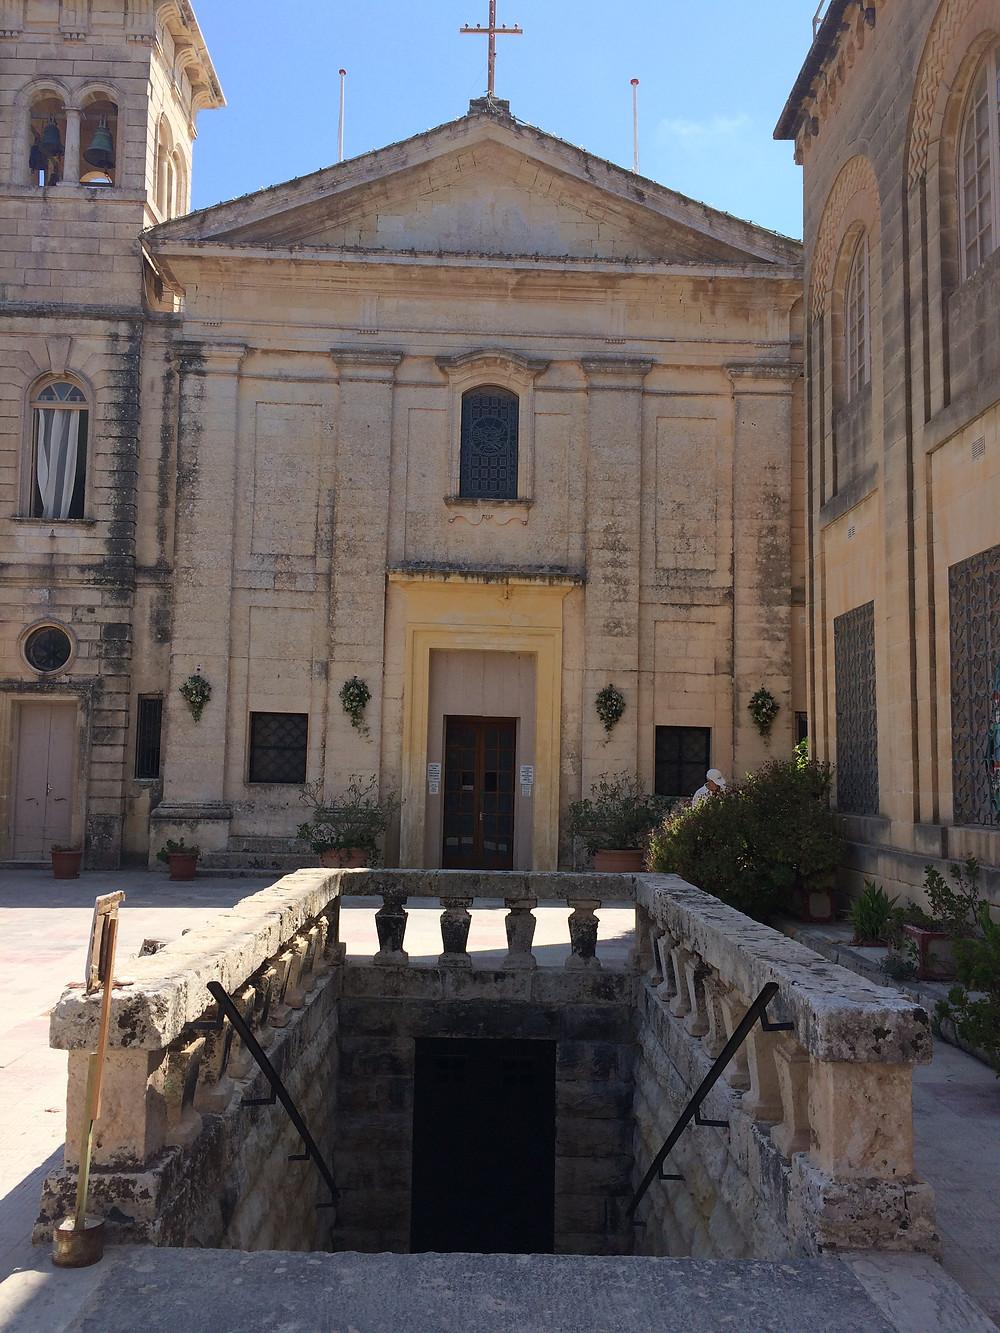 St.Agatha's Catacombs - Church and Stairs - 2mi3